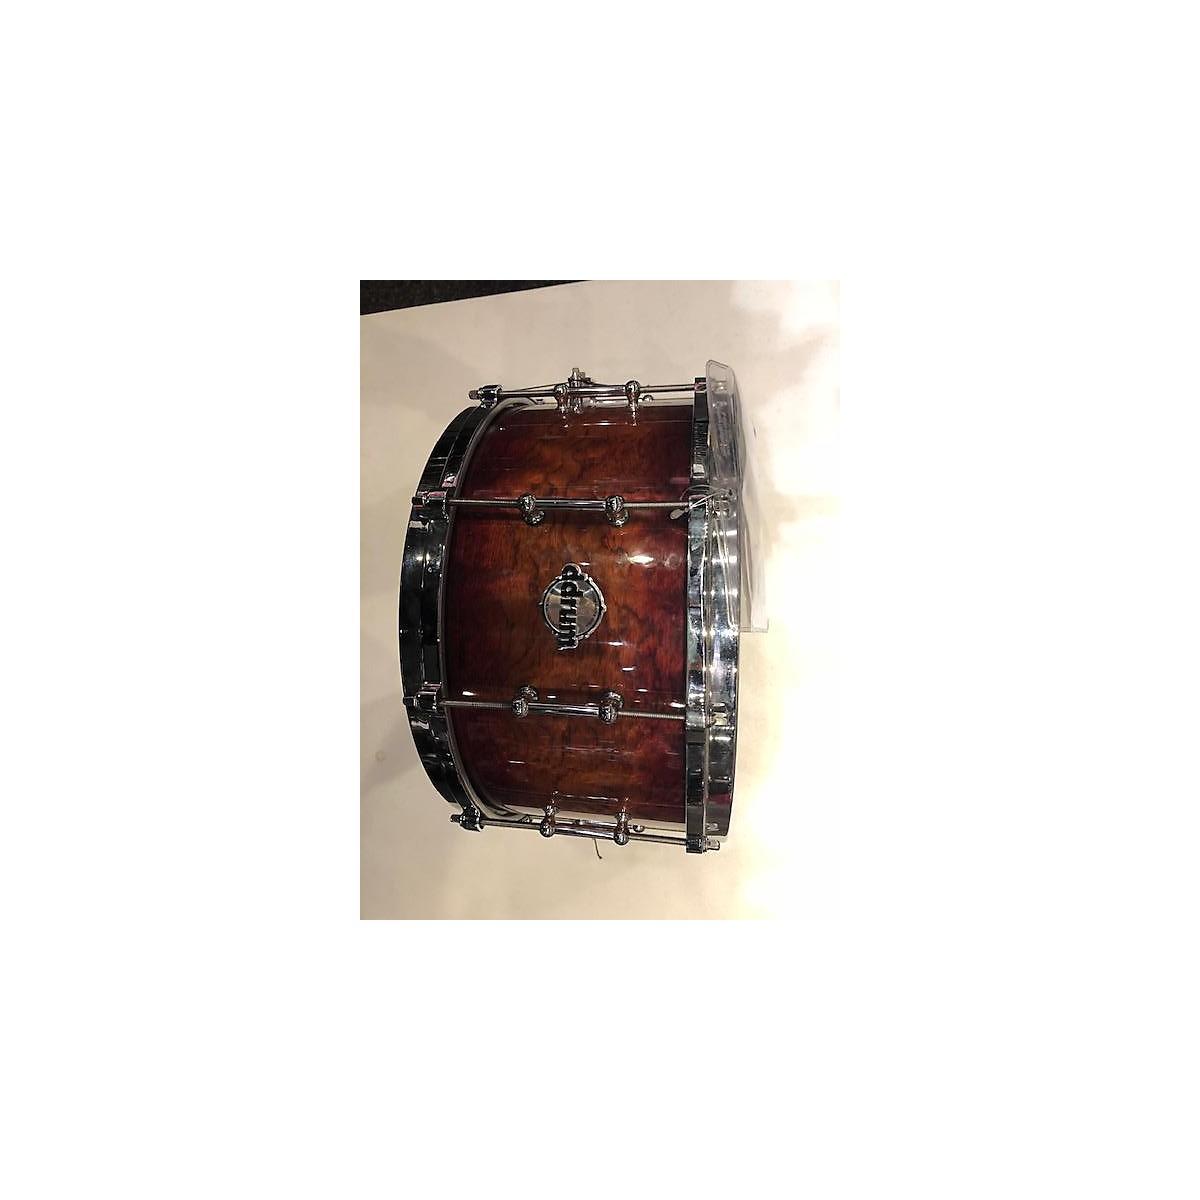 ddrum 6.5X14 Maple/Bubinga Custom Drum